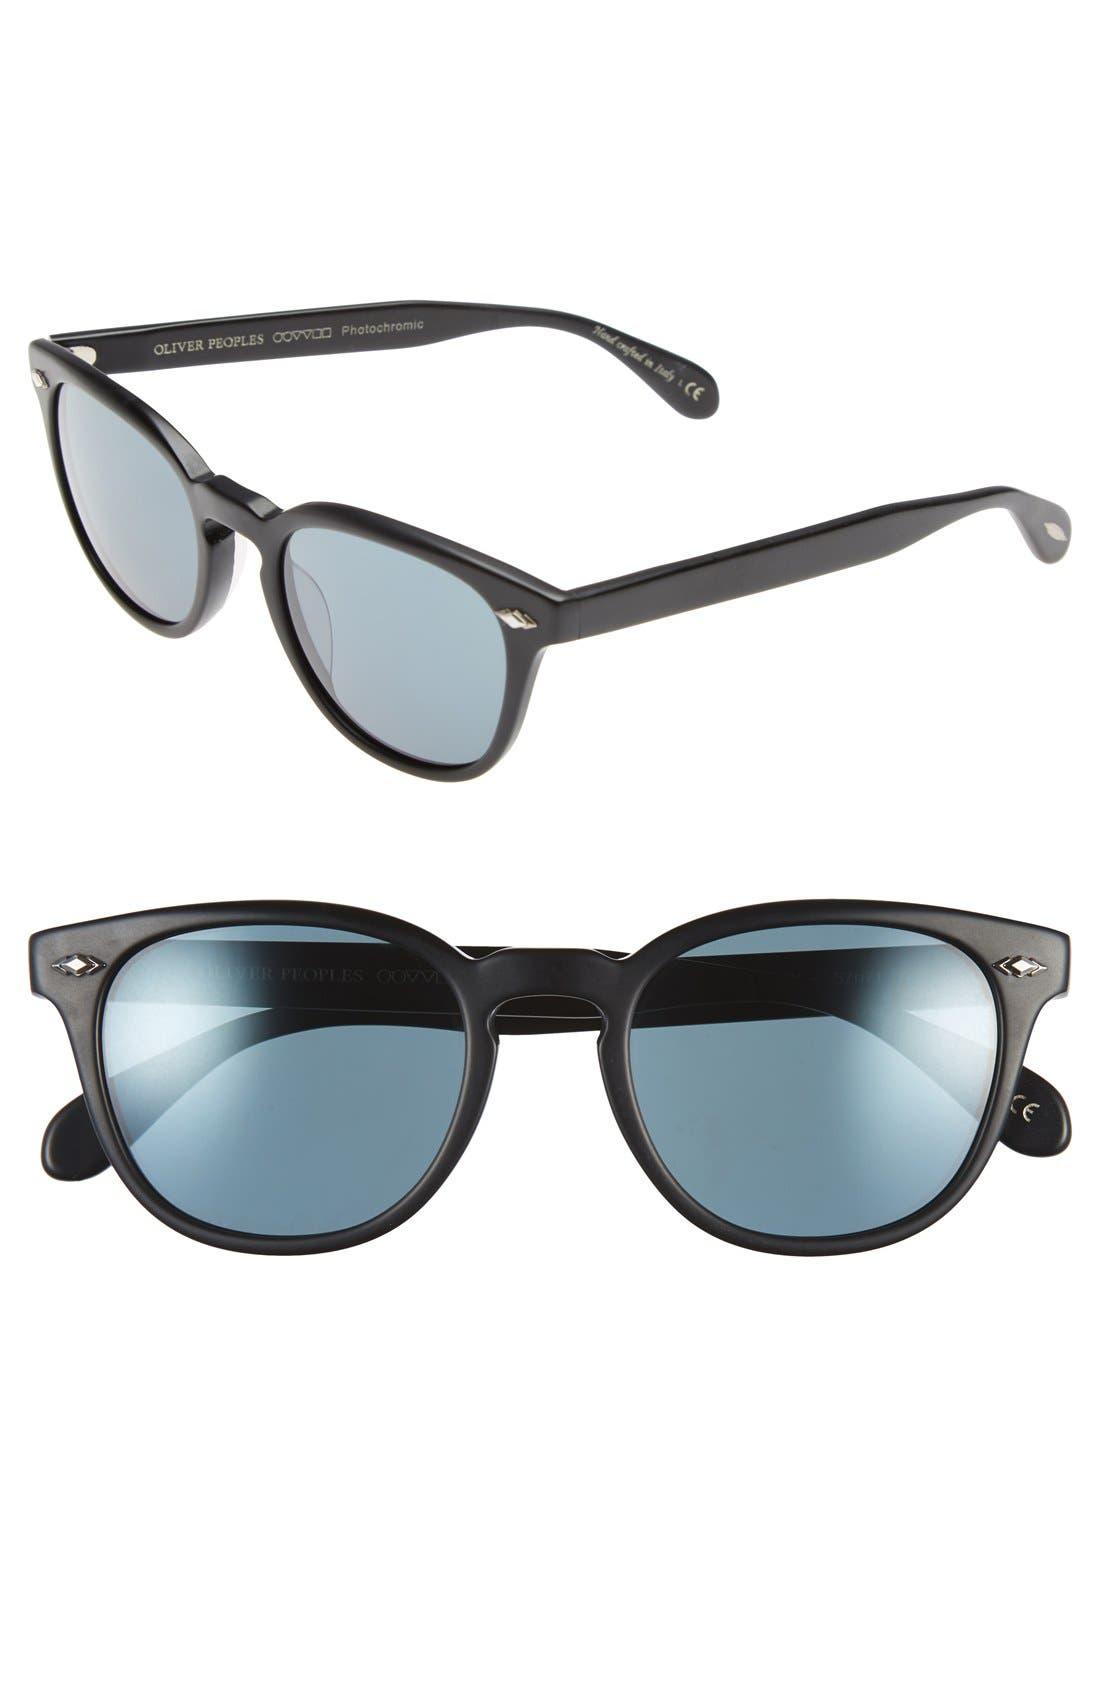 Main Image - Oliver Peoples 'Sheldrake Plus' 52mm Retro Sunglasses